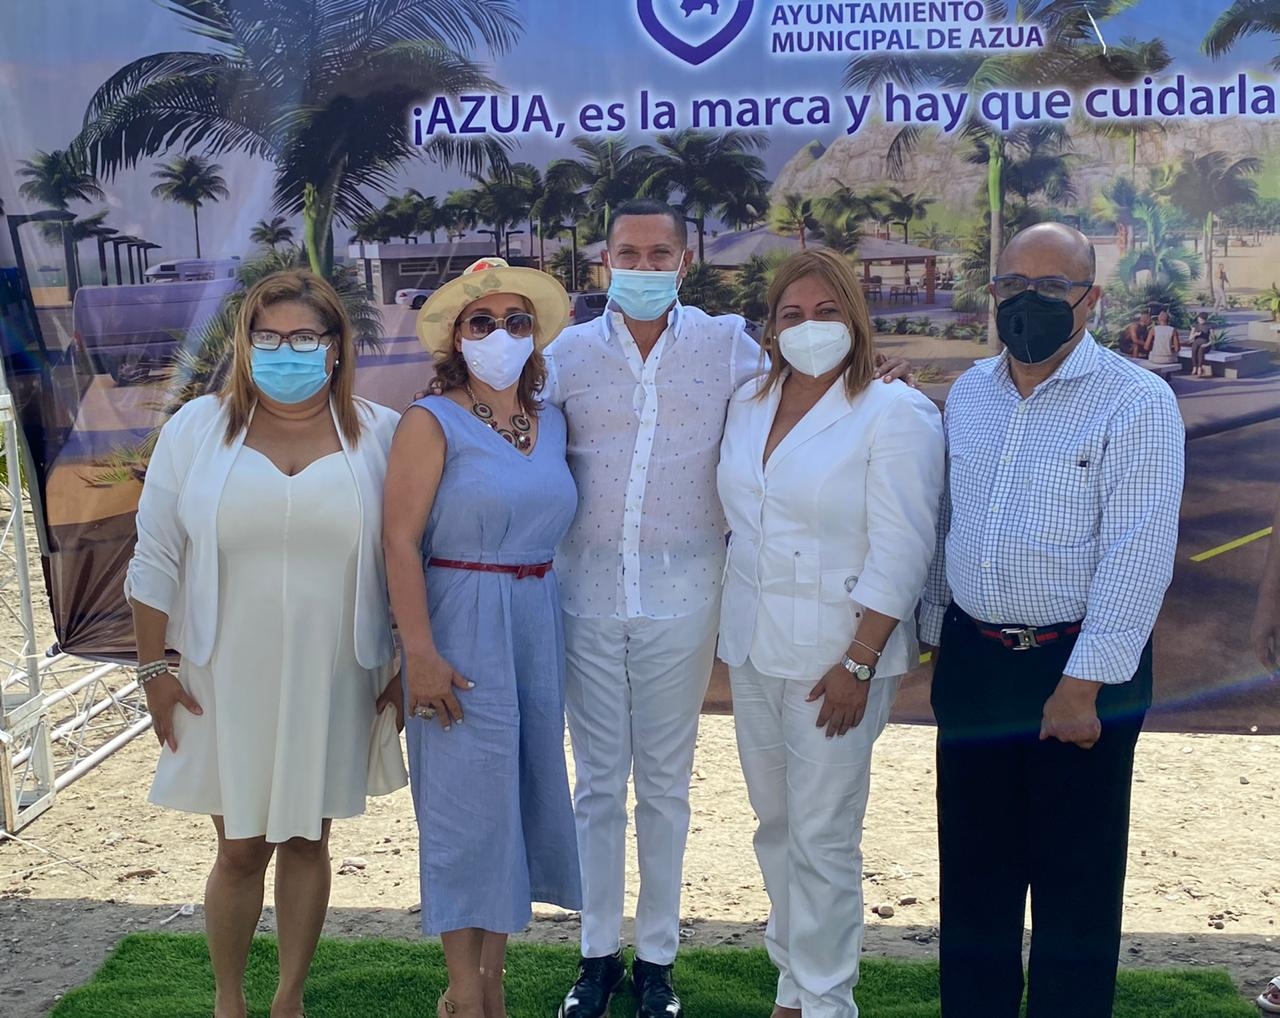 Angela Pérez, Mayra Pujols, Ruddy González, Maribel Hernández Y Alfredo Pacheco